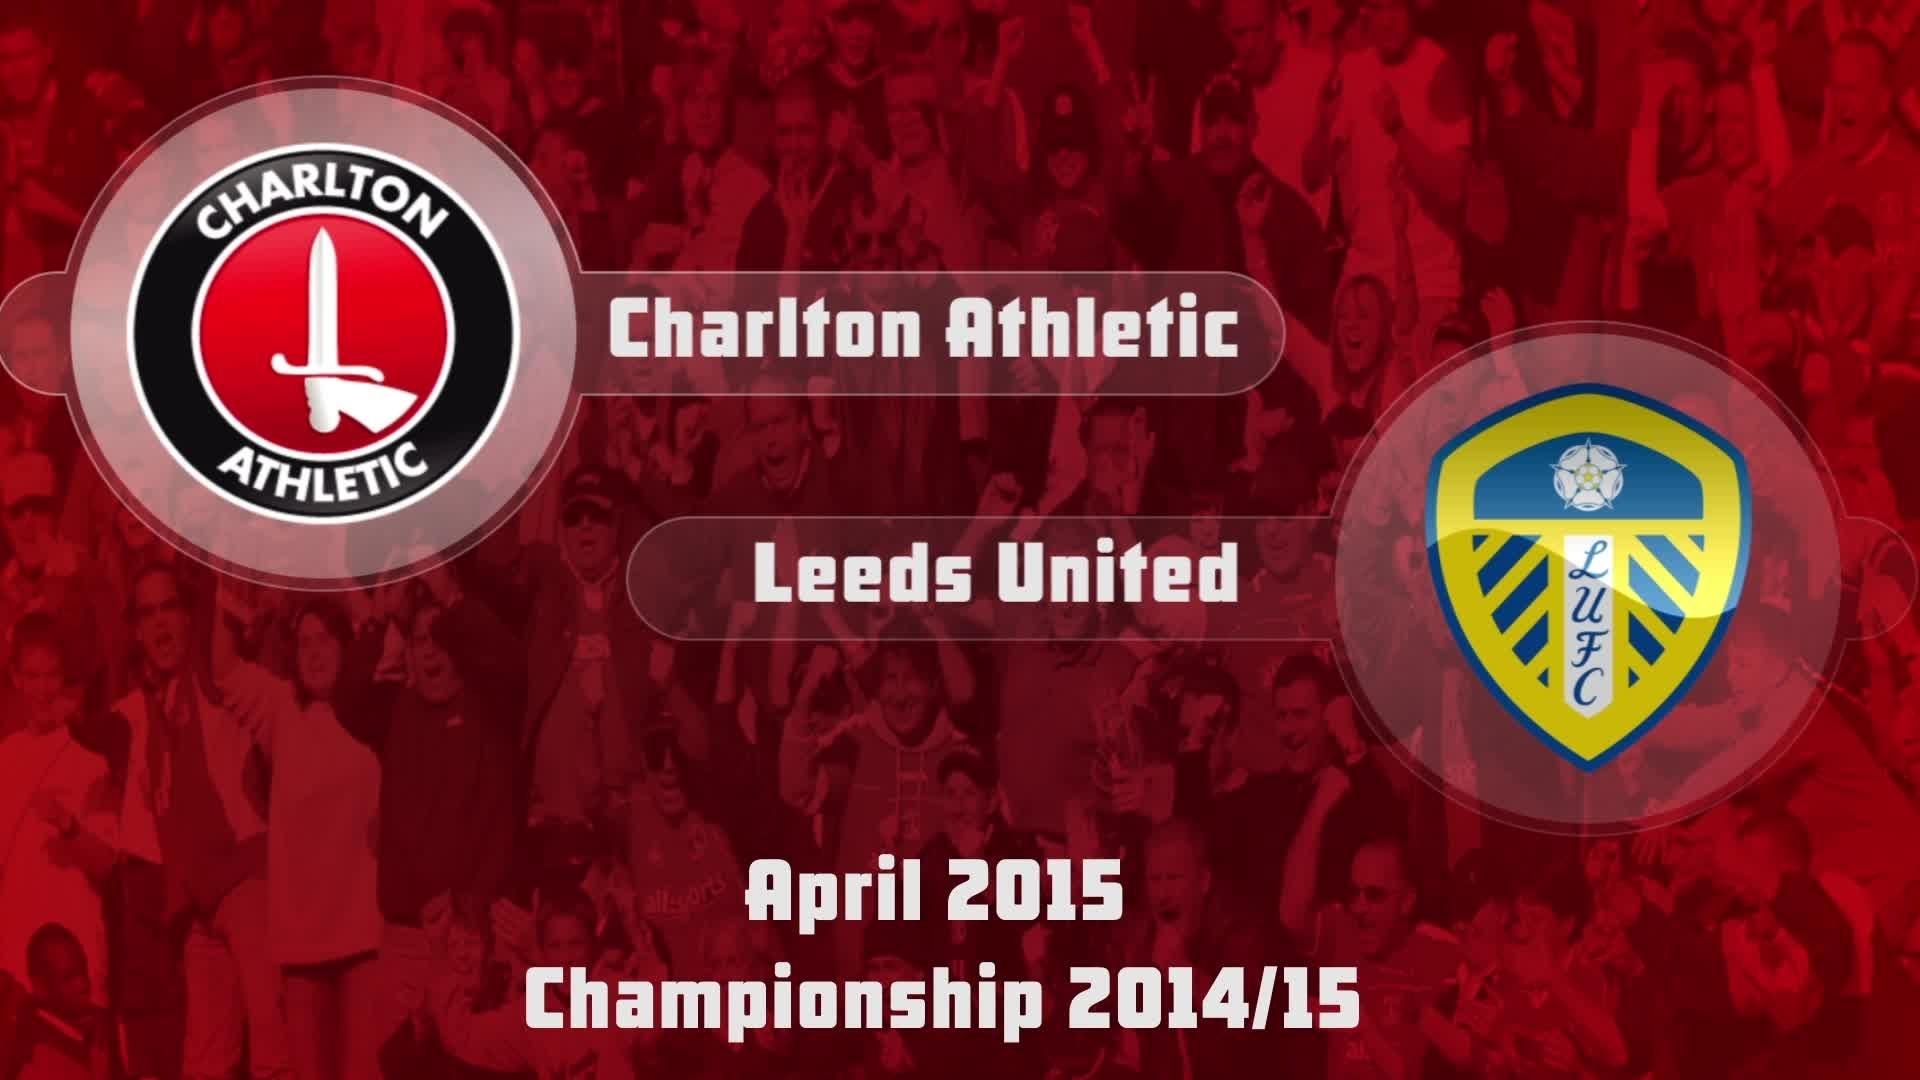 47 HIGHLIGHTS | Charlton 2 Leeds 1 (April 2015)